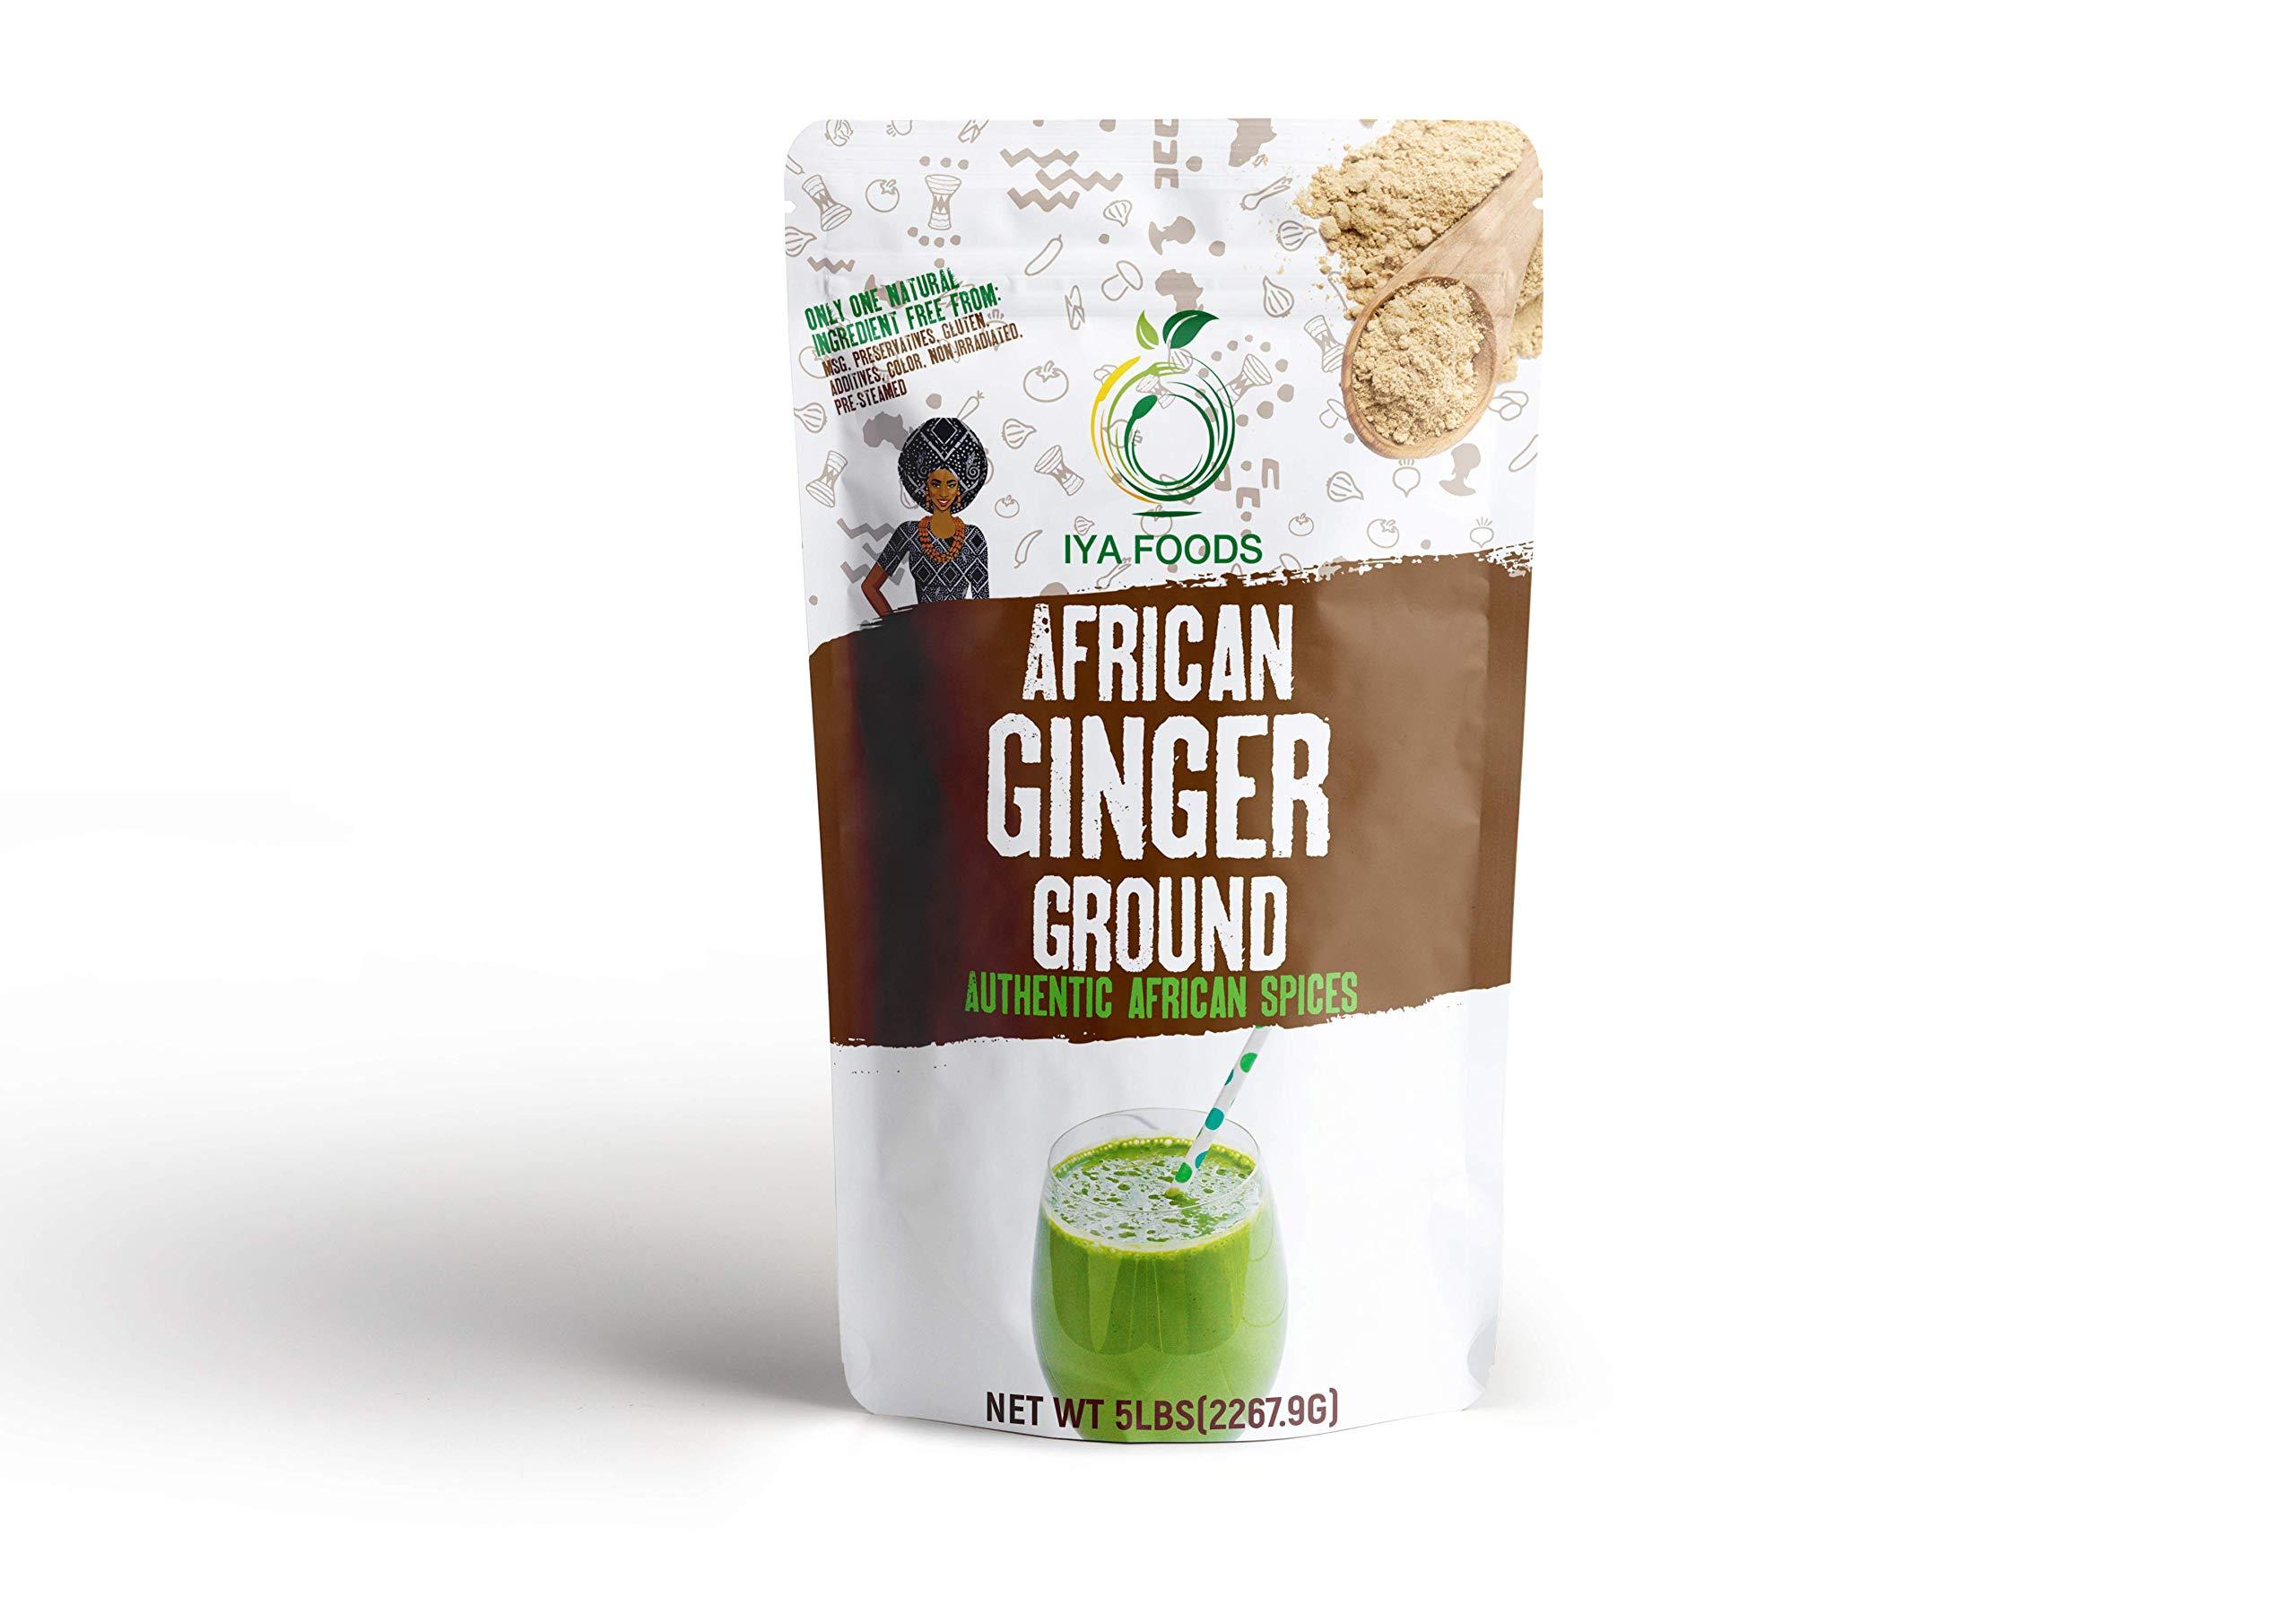 Iya Foods Ginger Ground 5 Lbs, Kosher Certified, No Preservatives, No Added Color, No Additives, No MSG